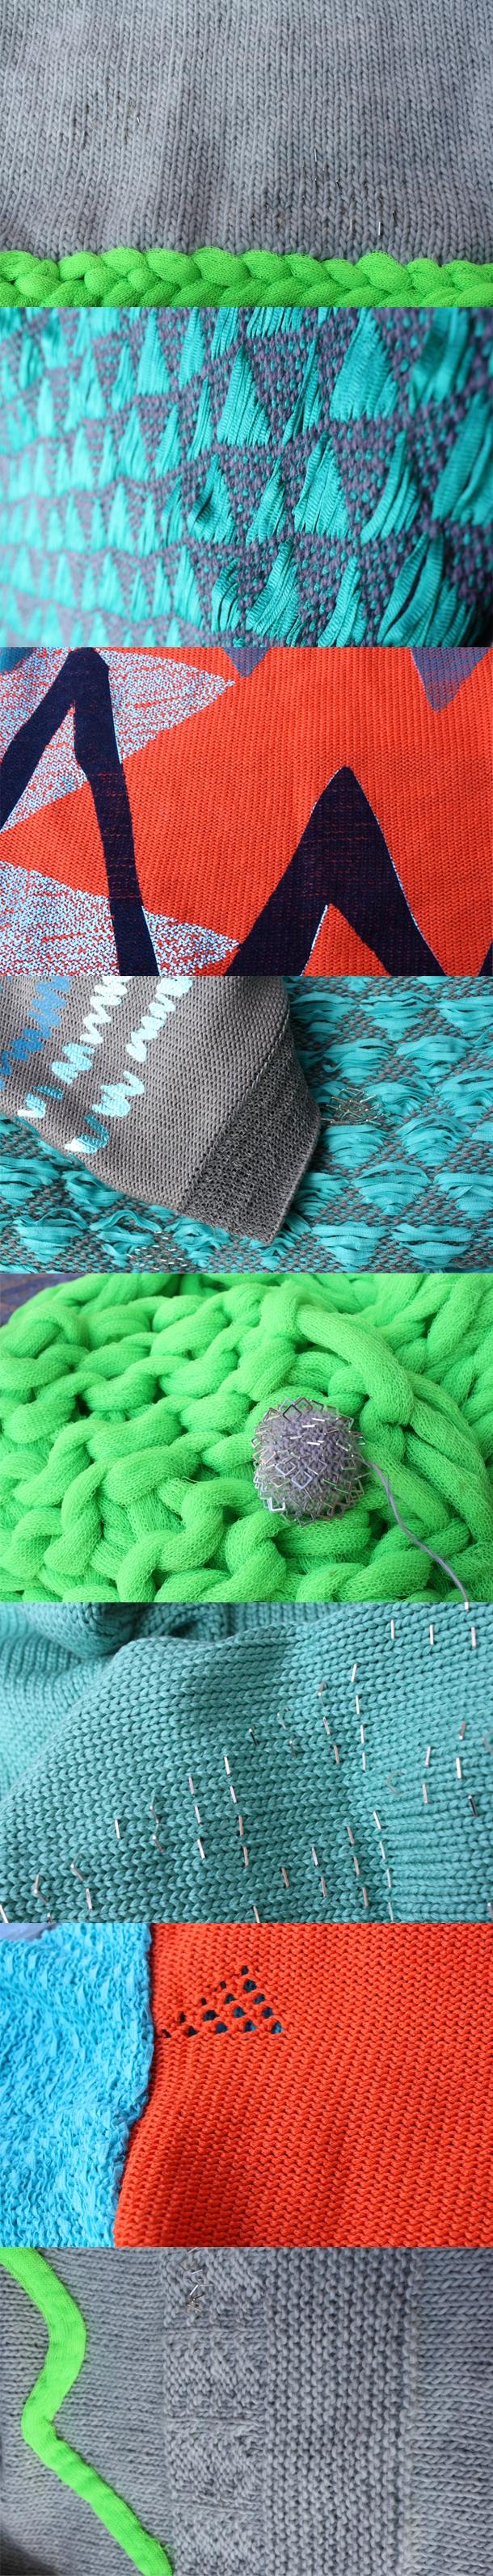 Marie Leiknes - Knit Textures A/W 2012